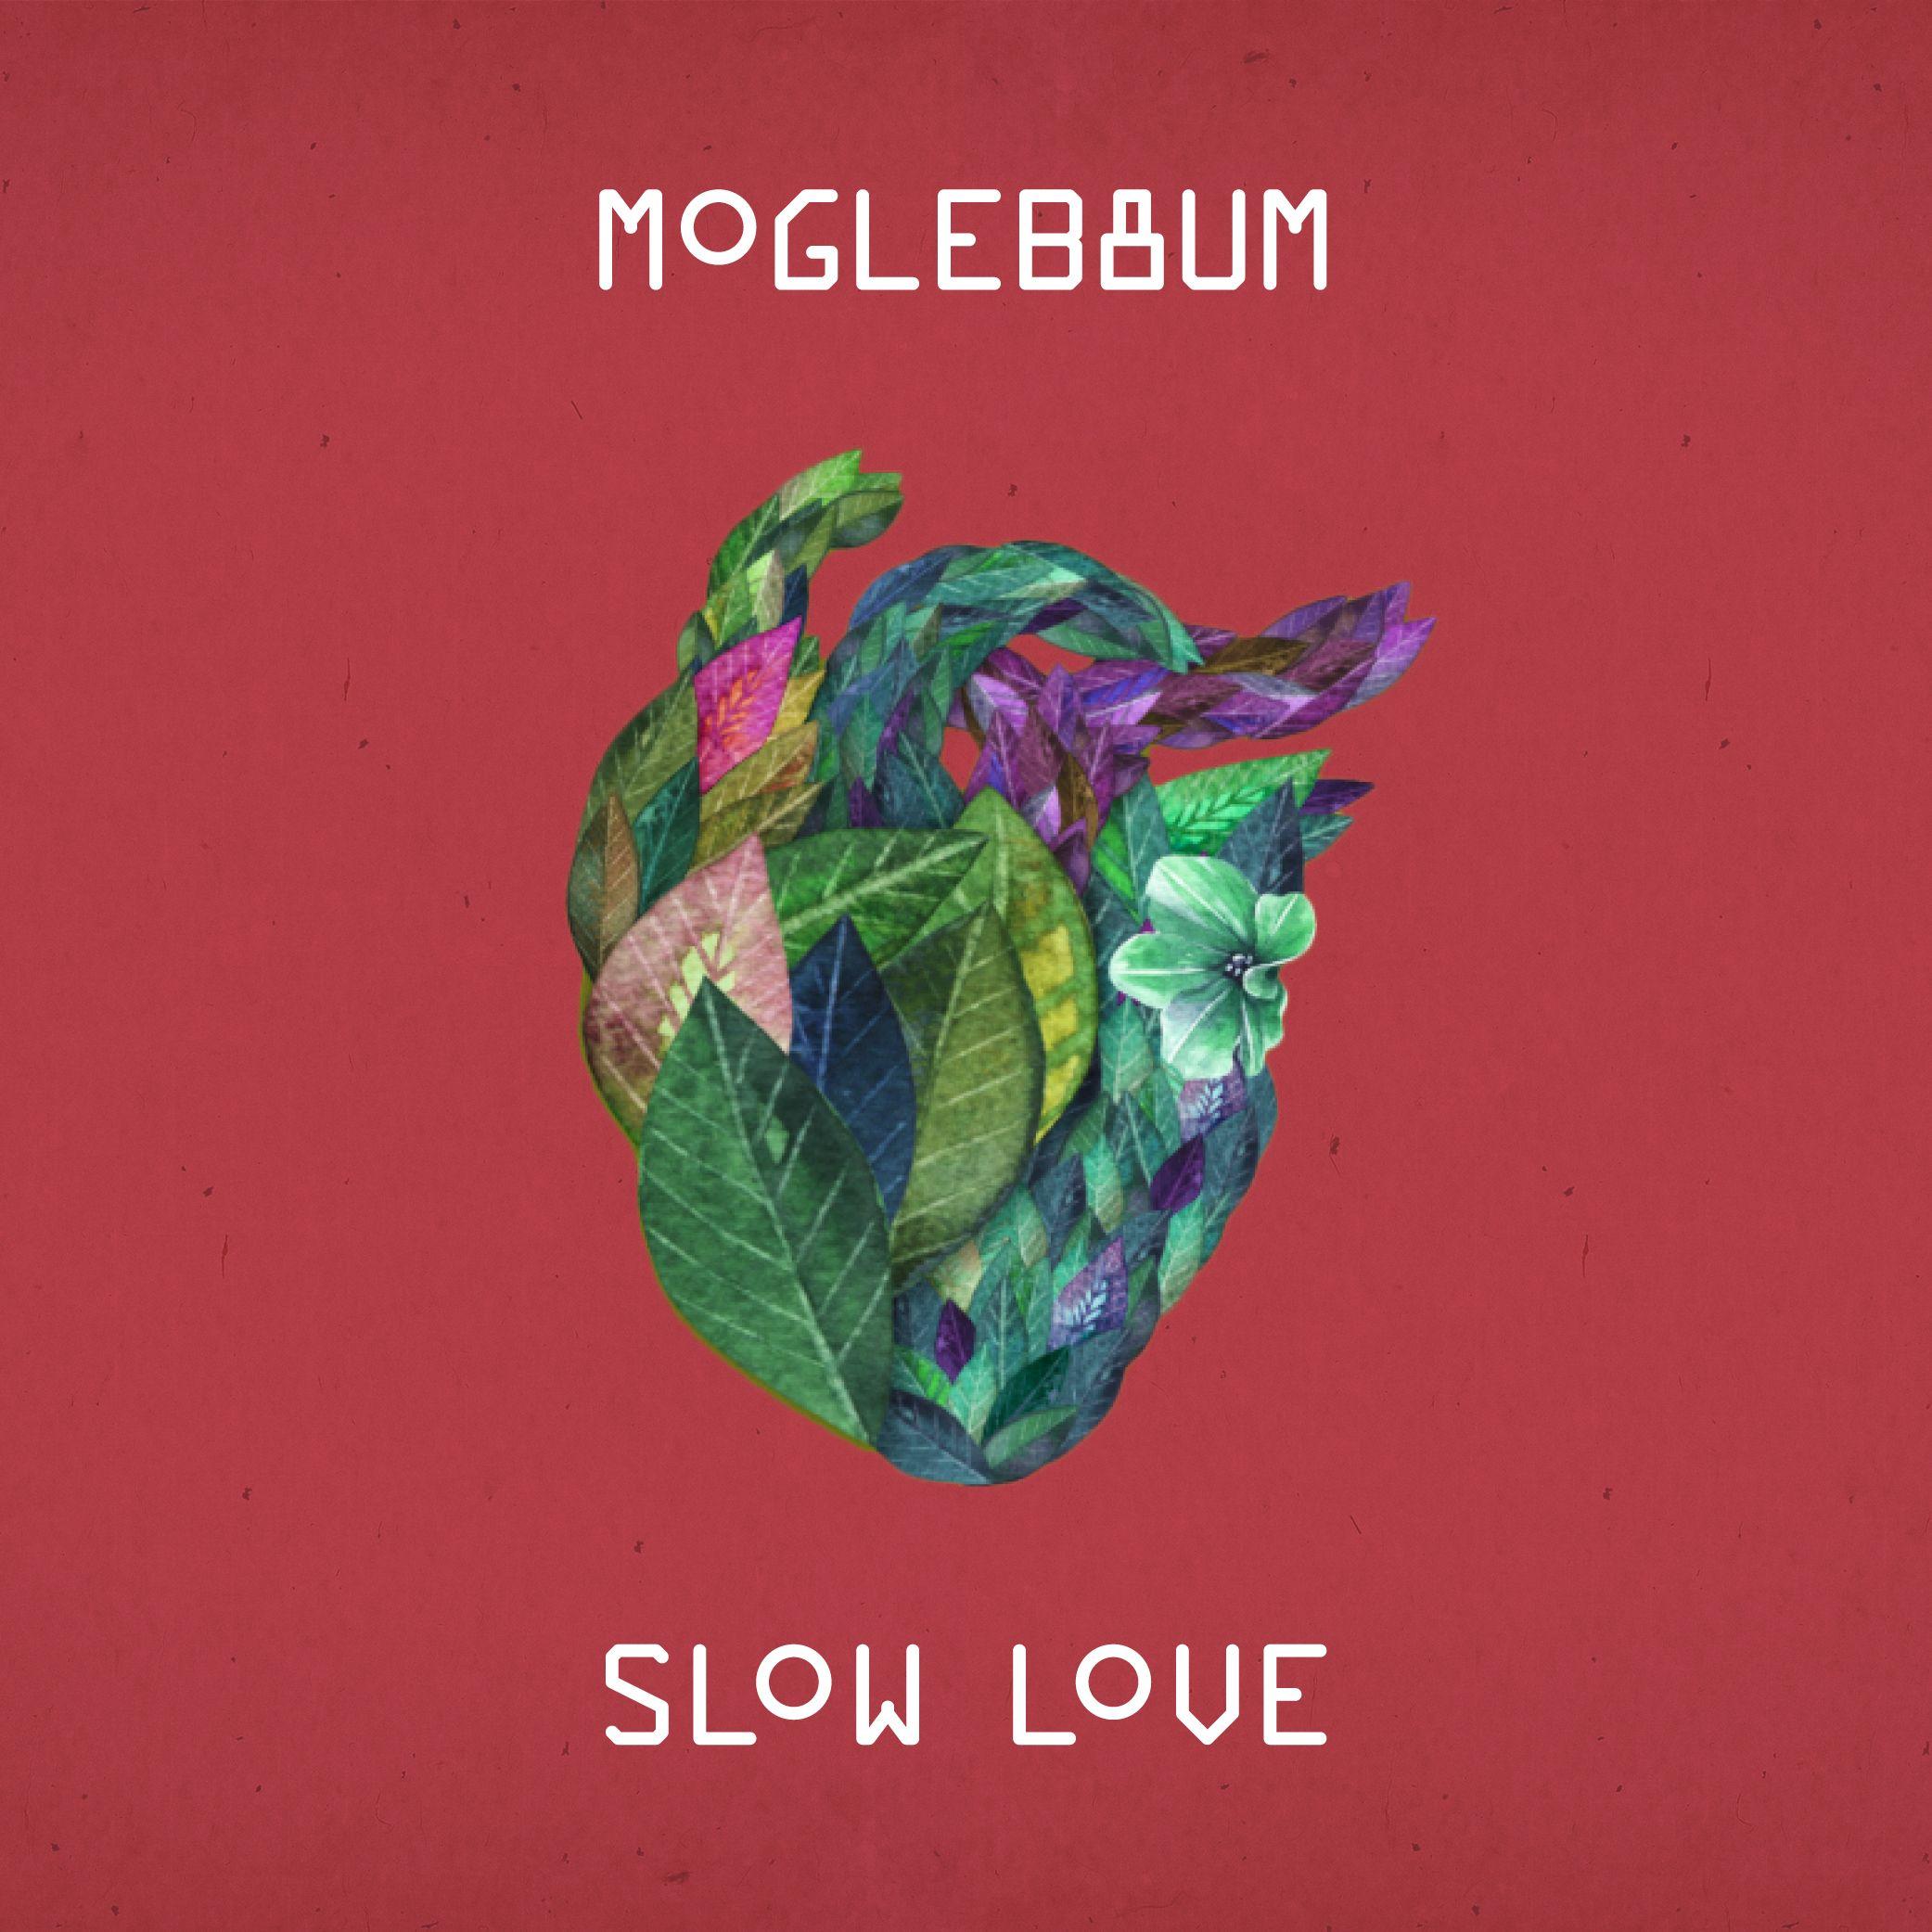 slow_love_cover.jpg